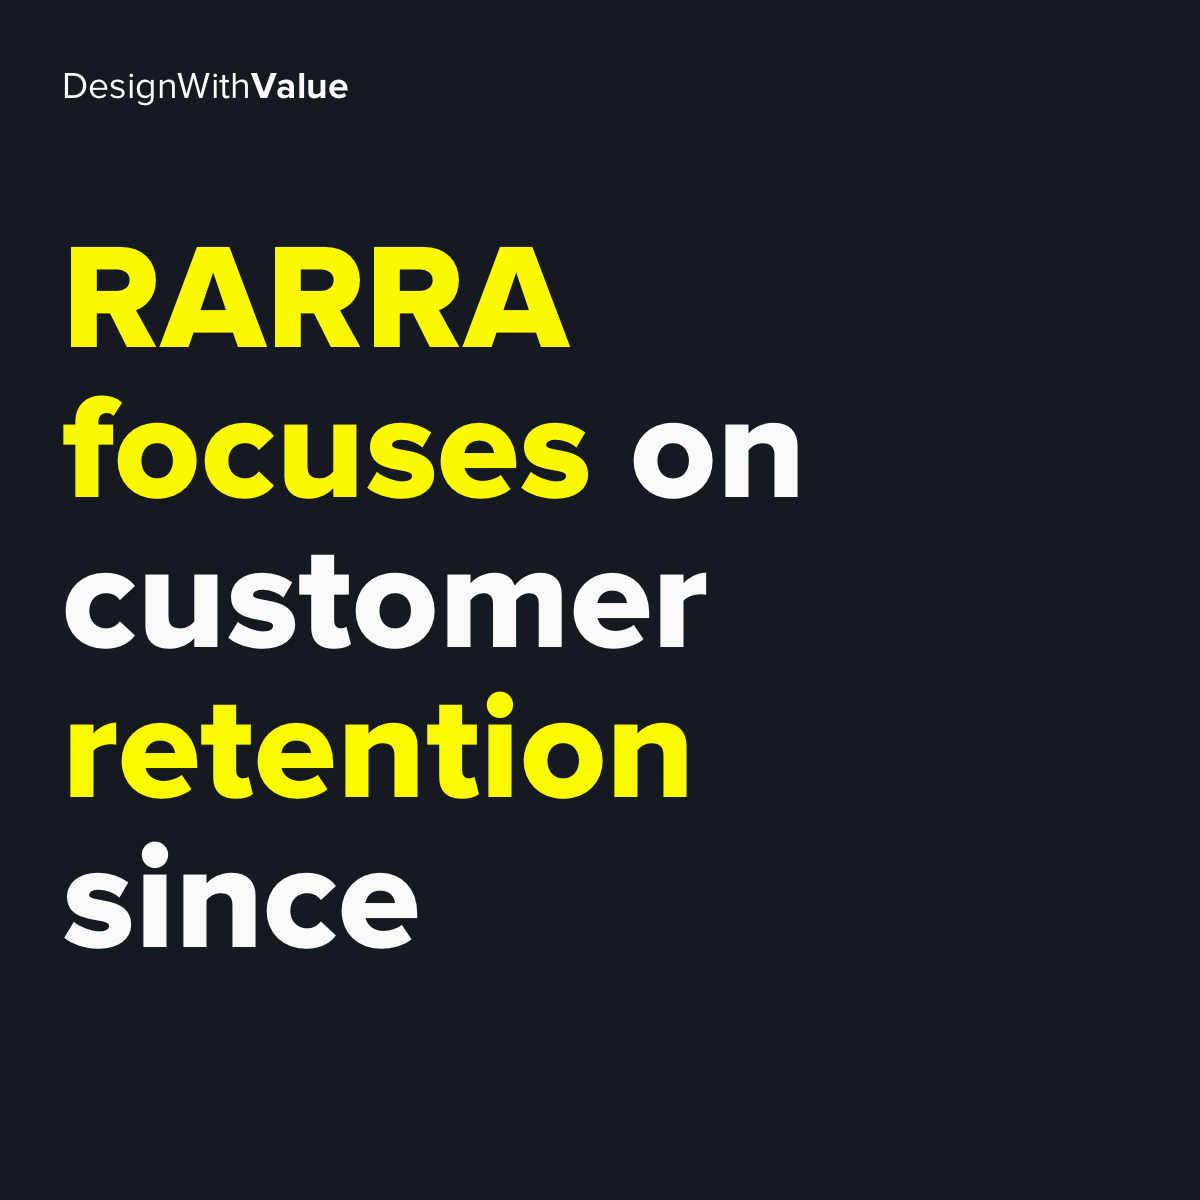 RARRA focuses on retention since...